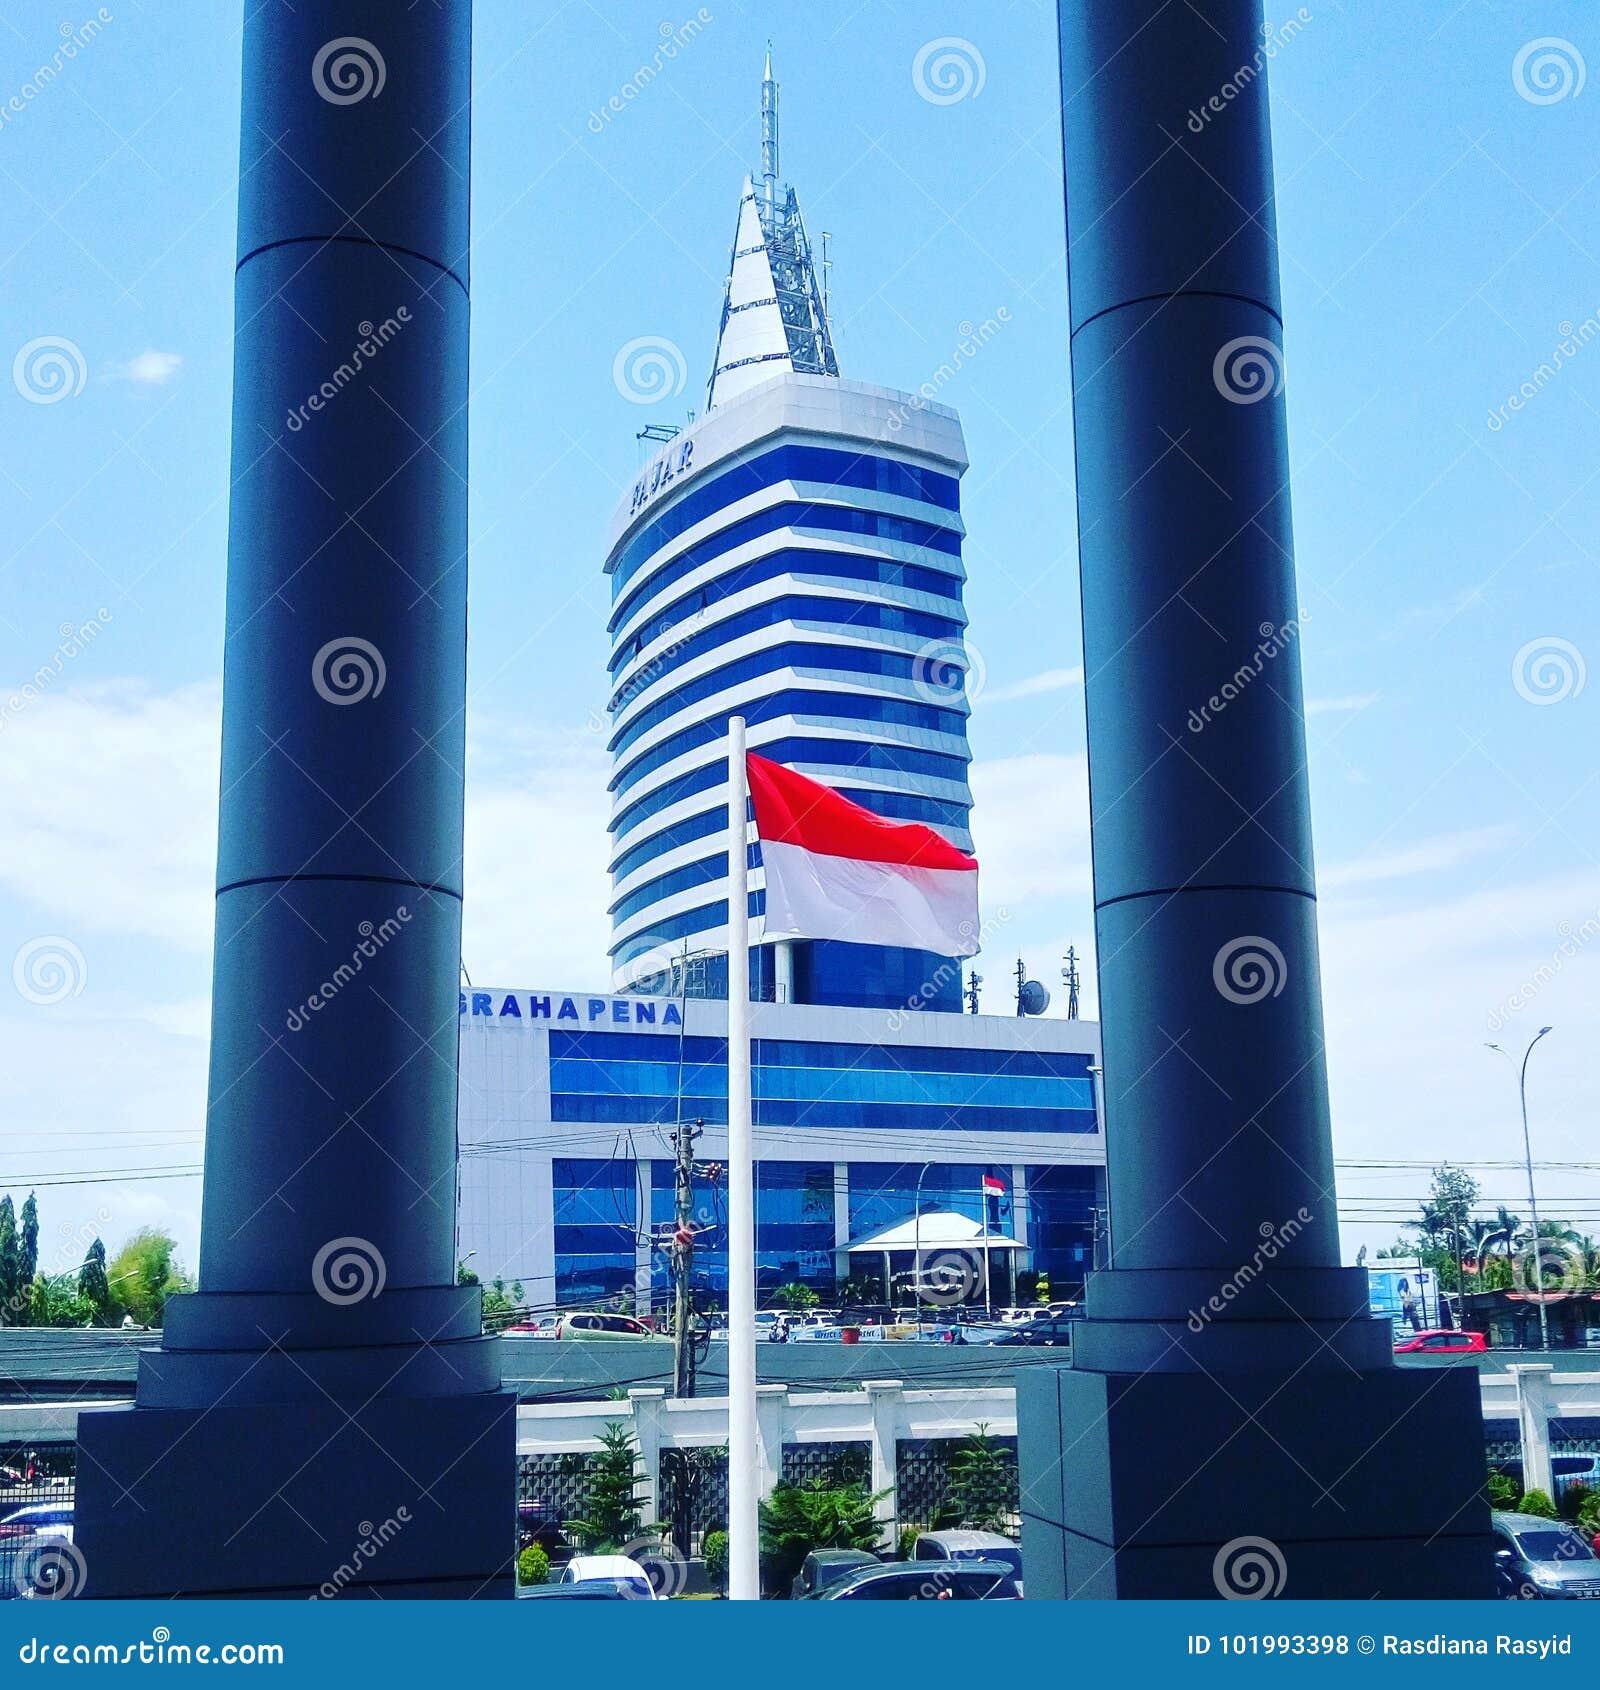 Graha Pena Building